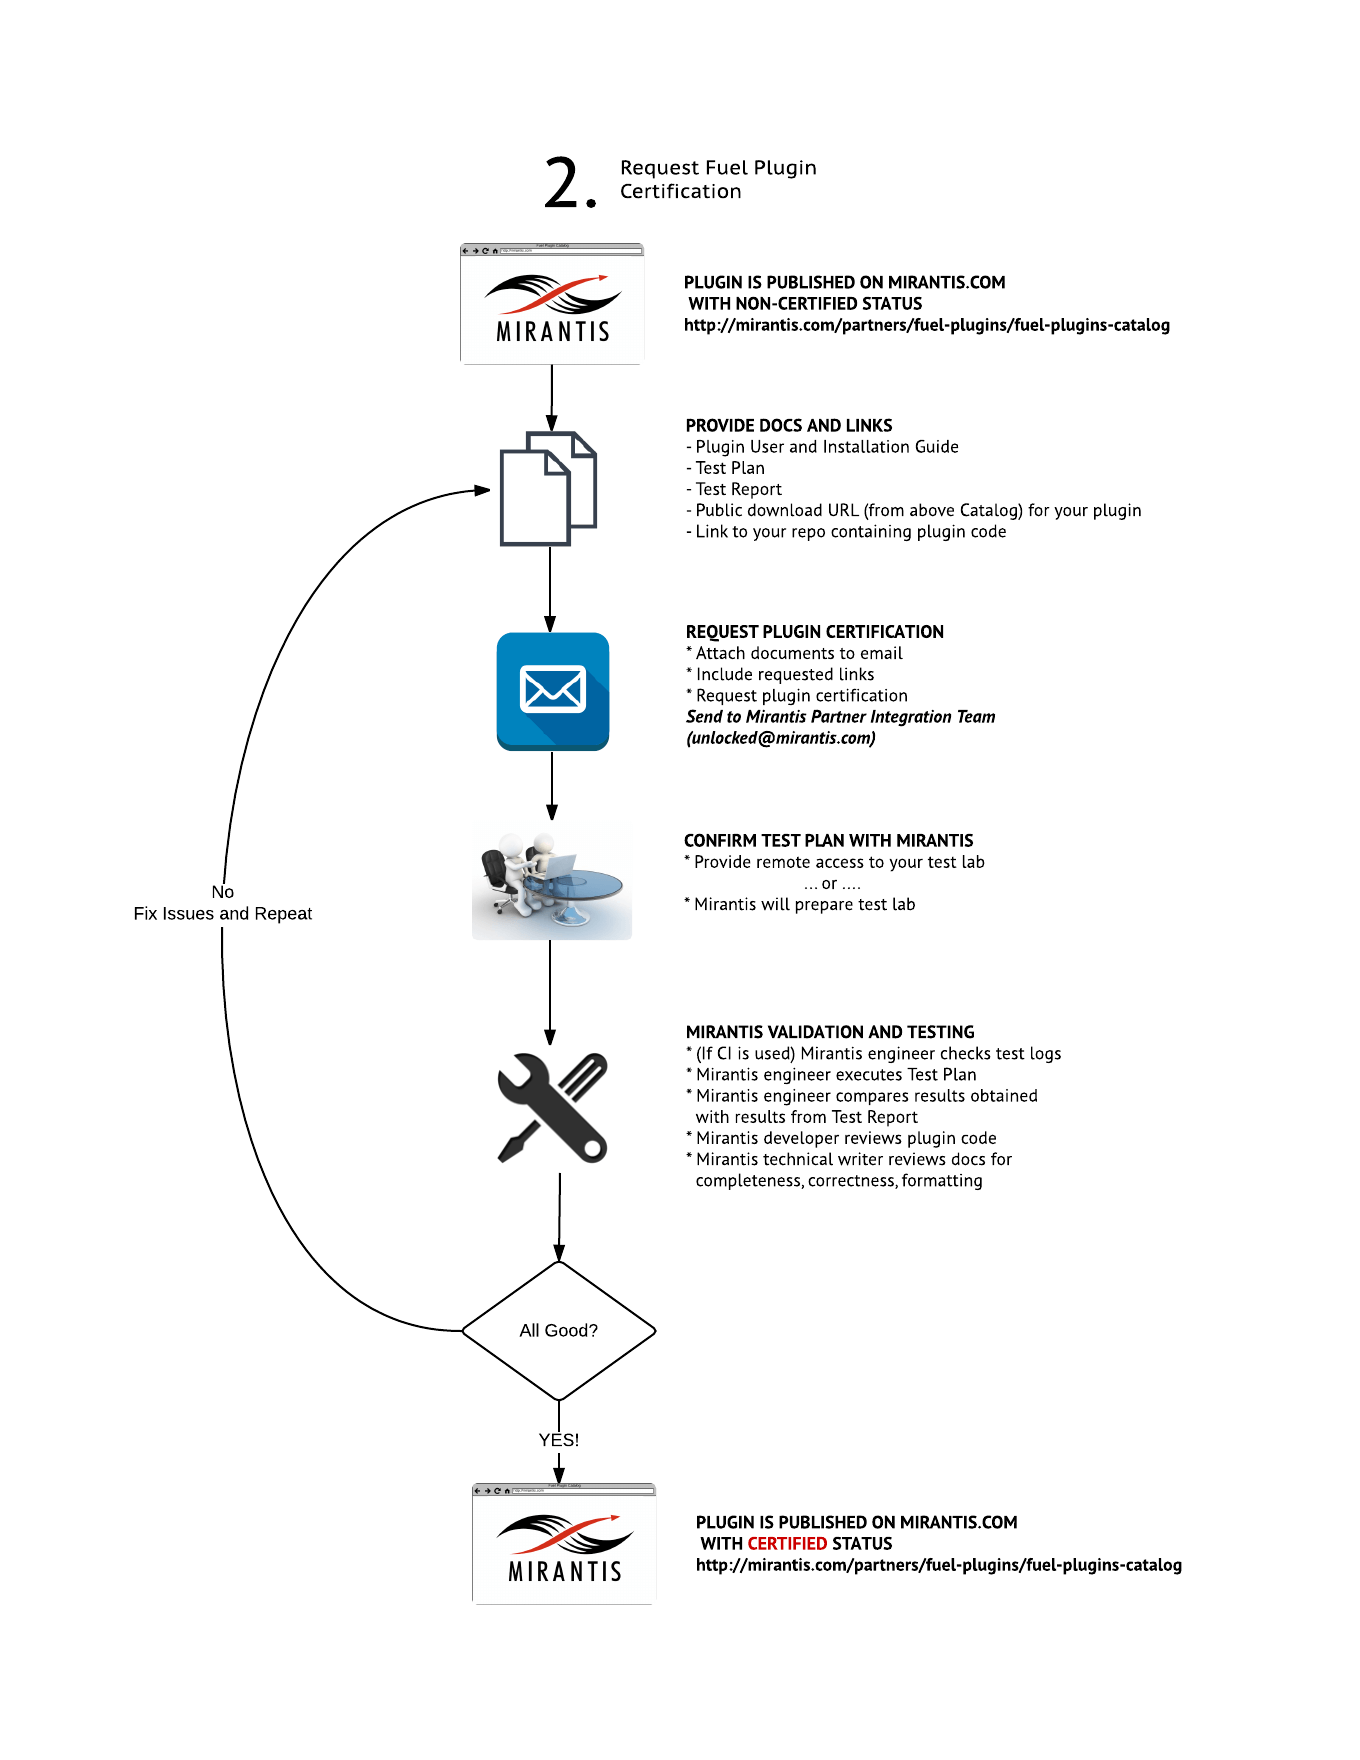 Fuel Plugin Certification Mirantis